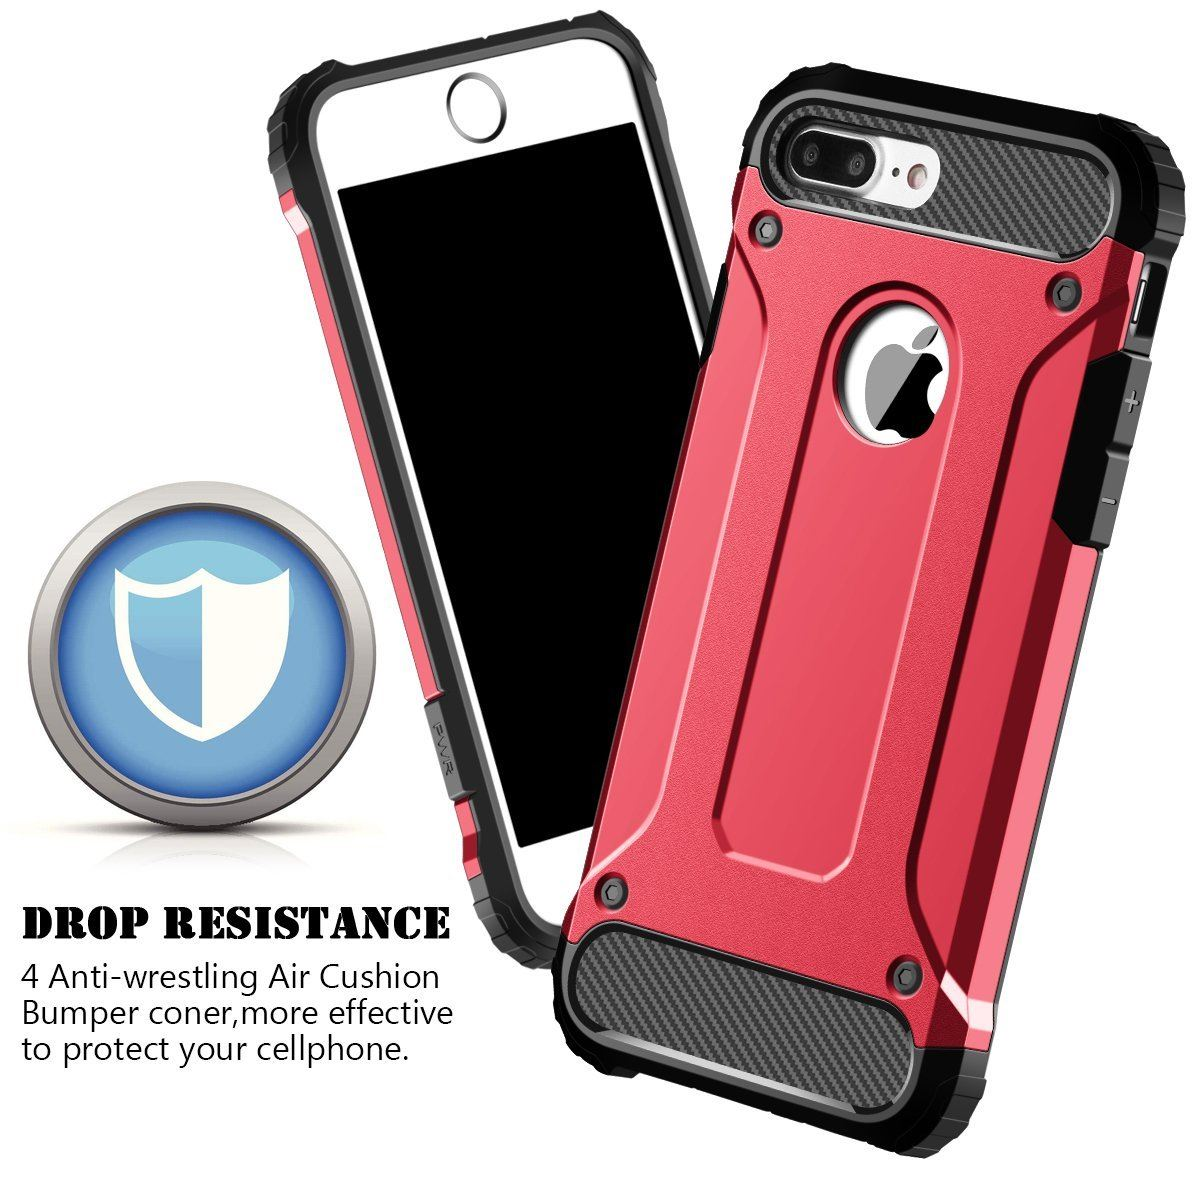 thumbnail 68 - For Apple iPhone 11 Pro Max XR Xs X 8 7 Plus 6 5 Se Case Cover Tough Armor